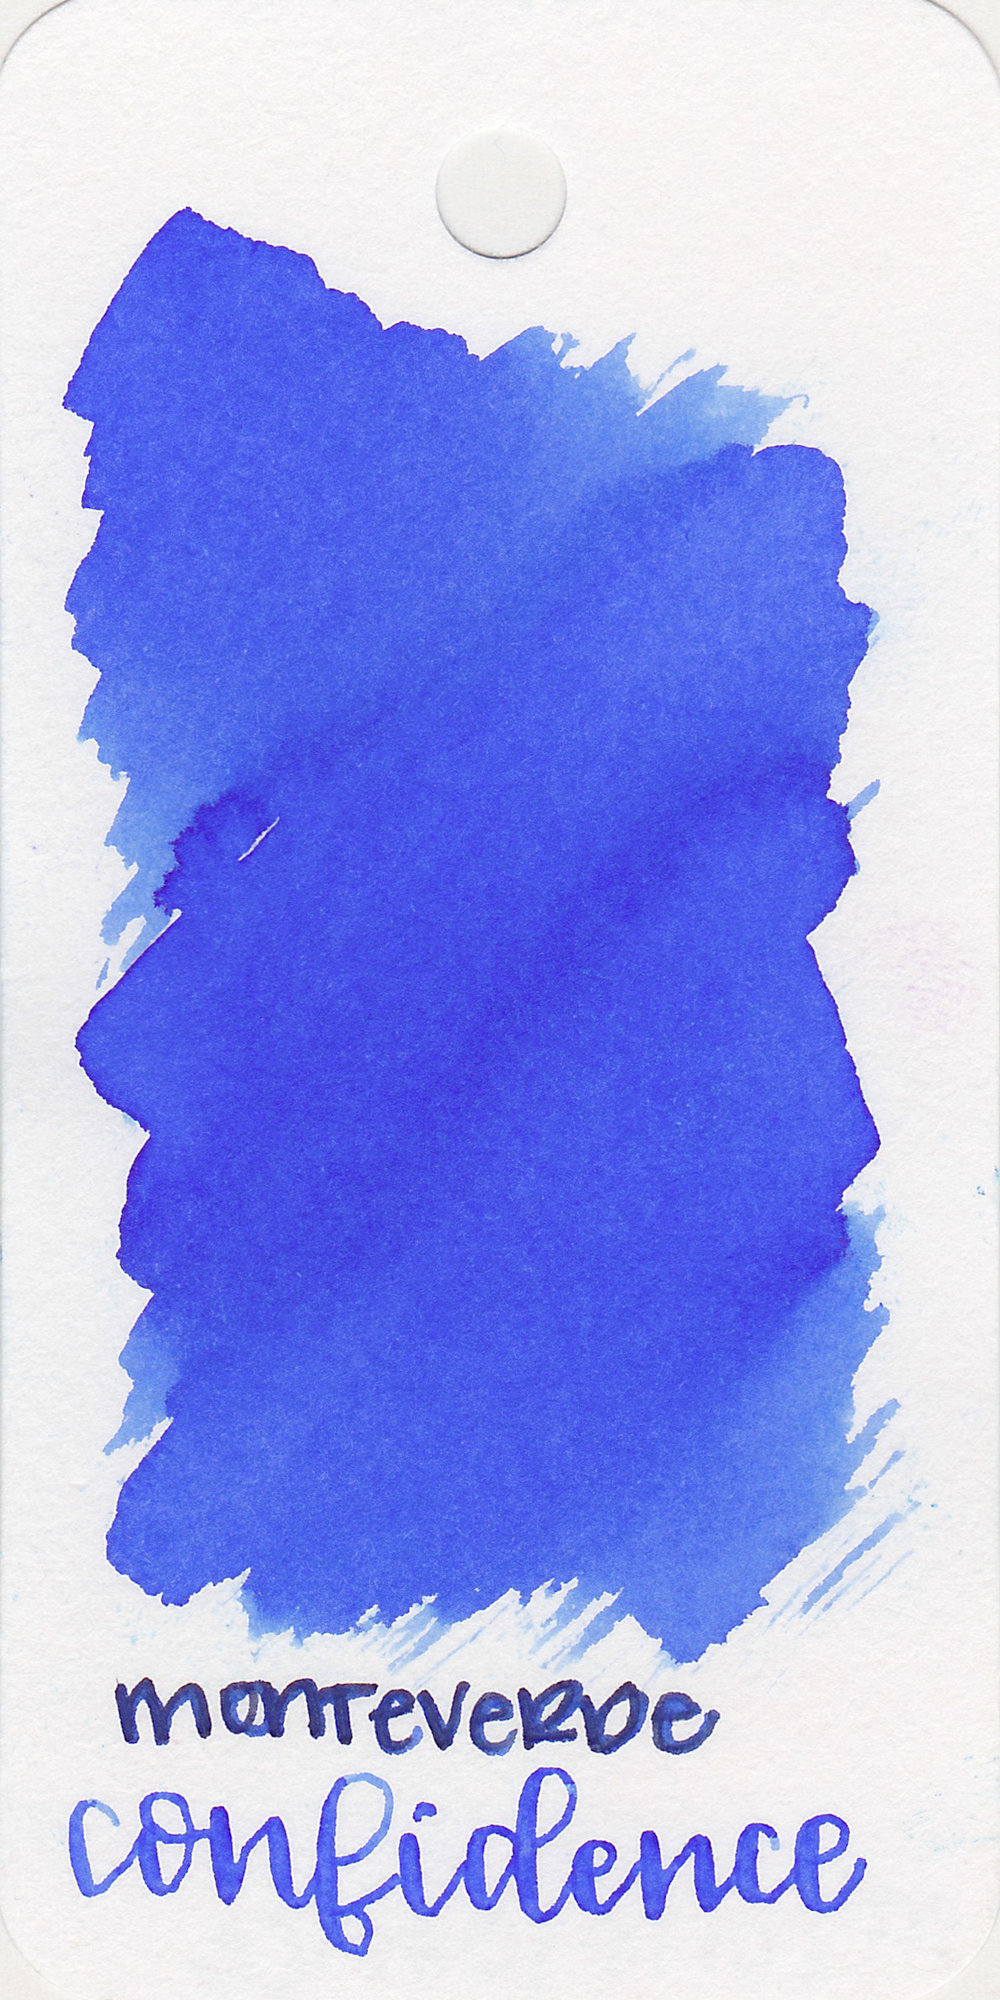 mv-confidence-blue-1.jpg